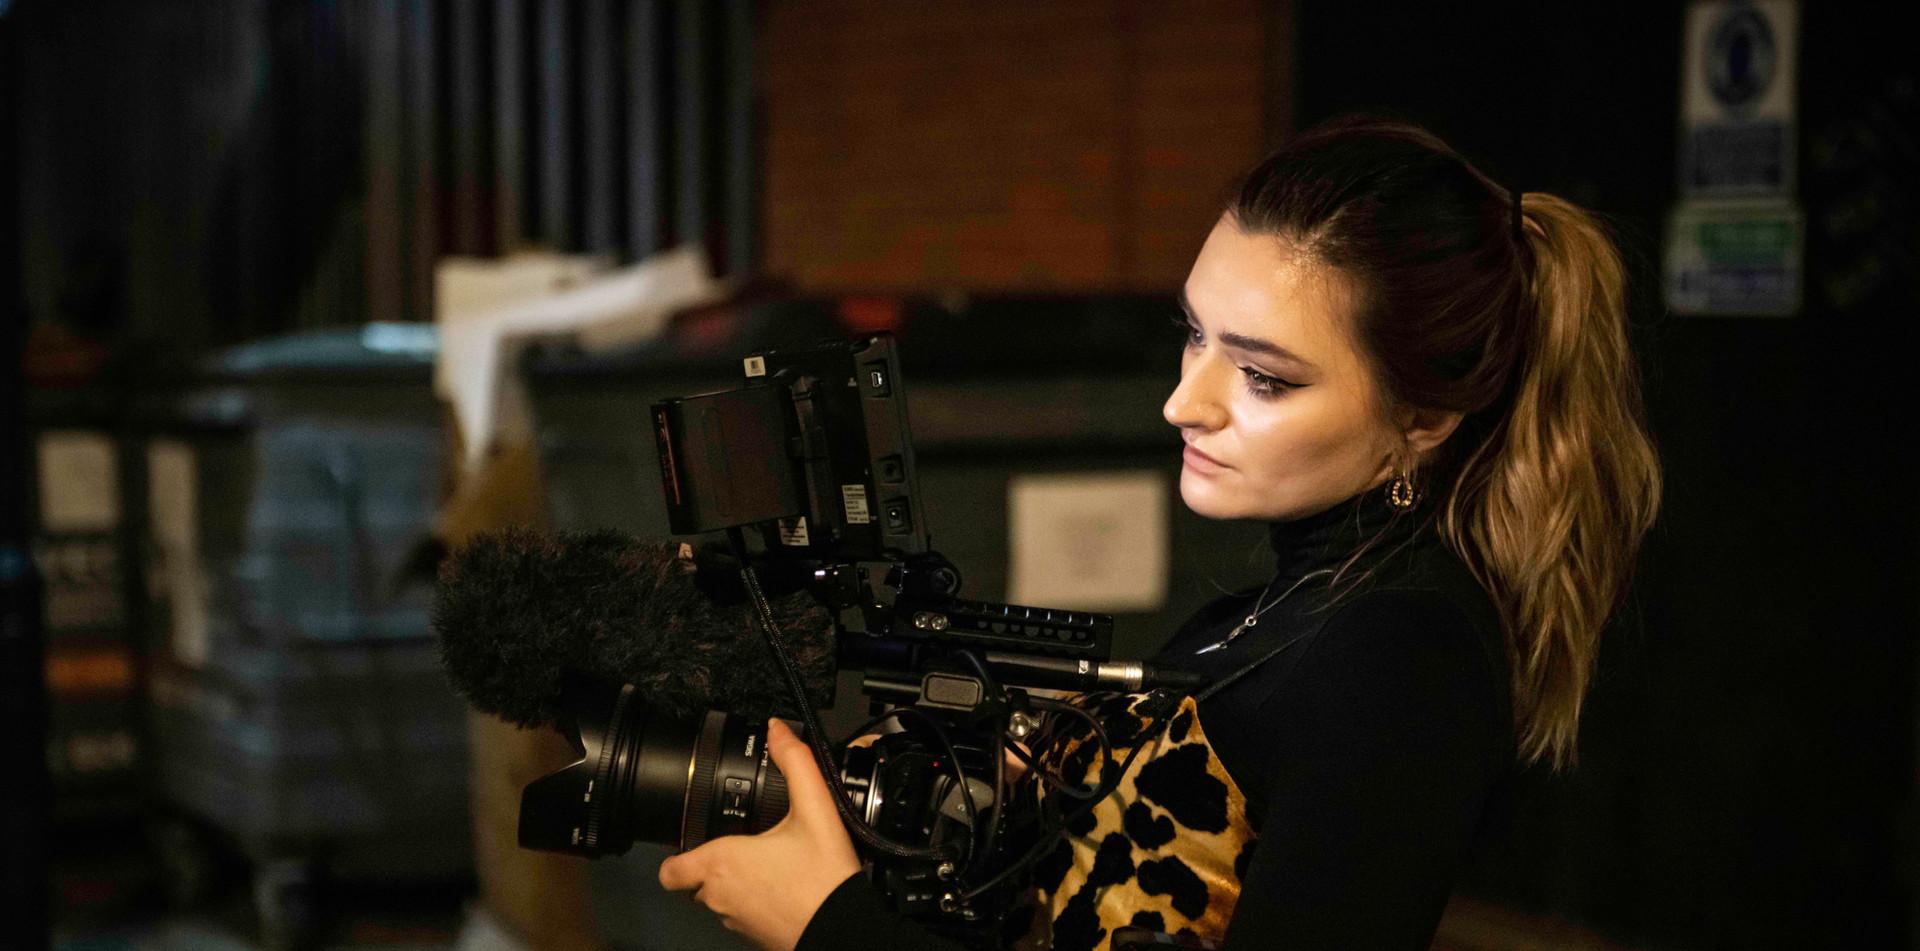 Videography Rifffest 2020